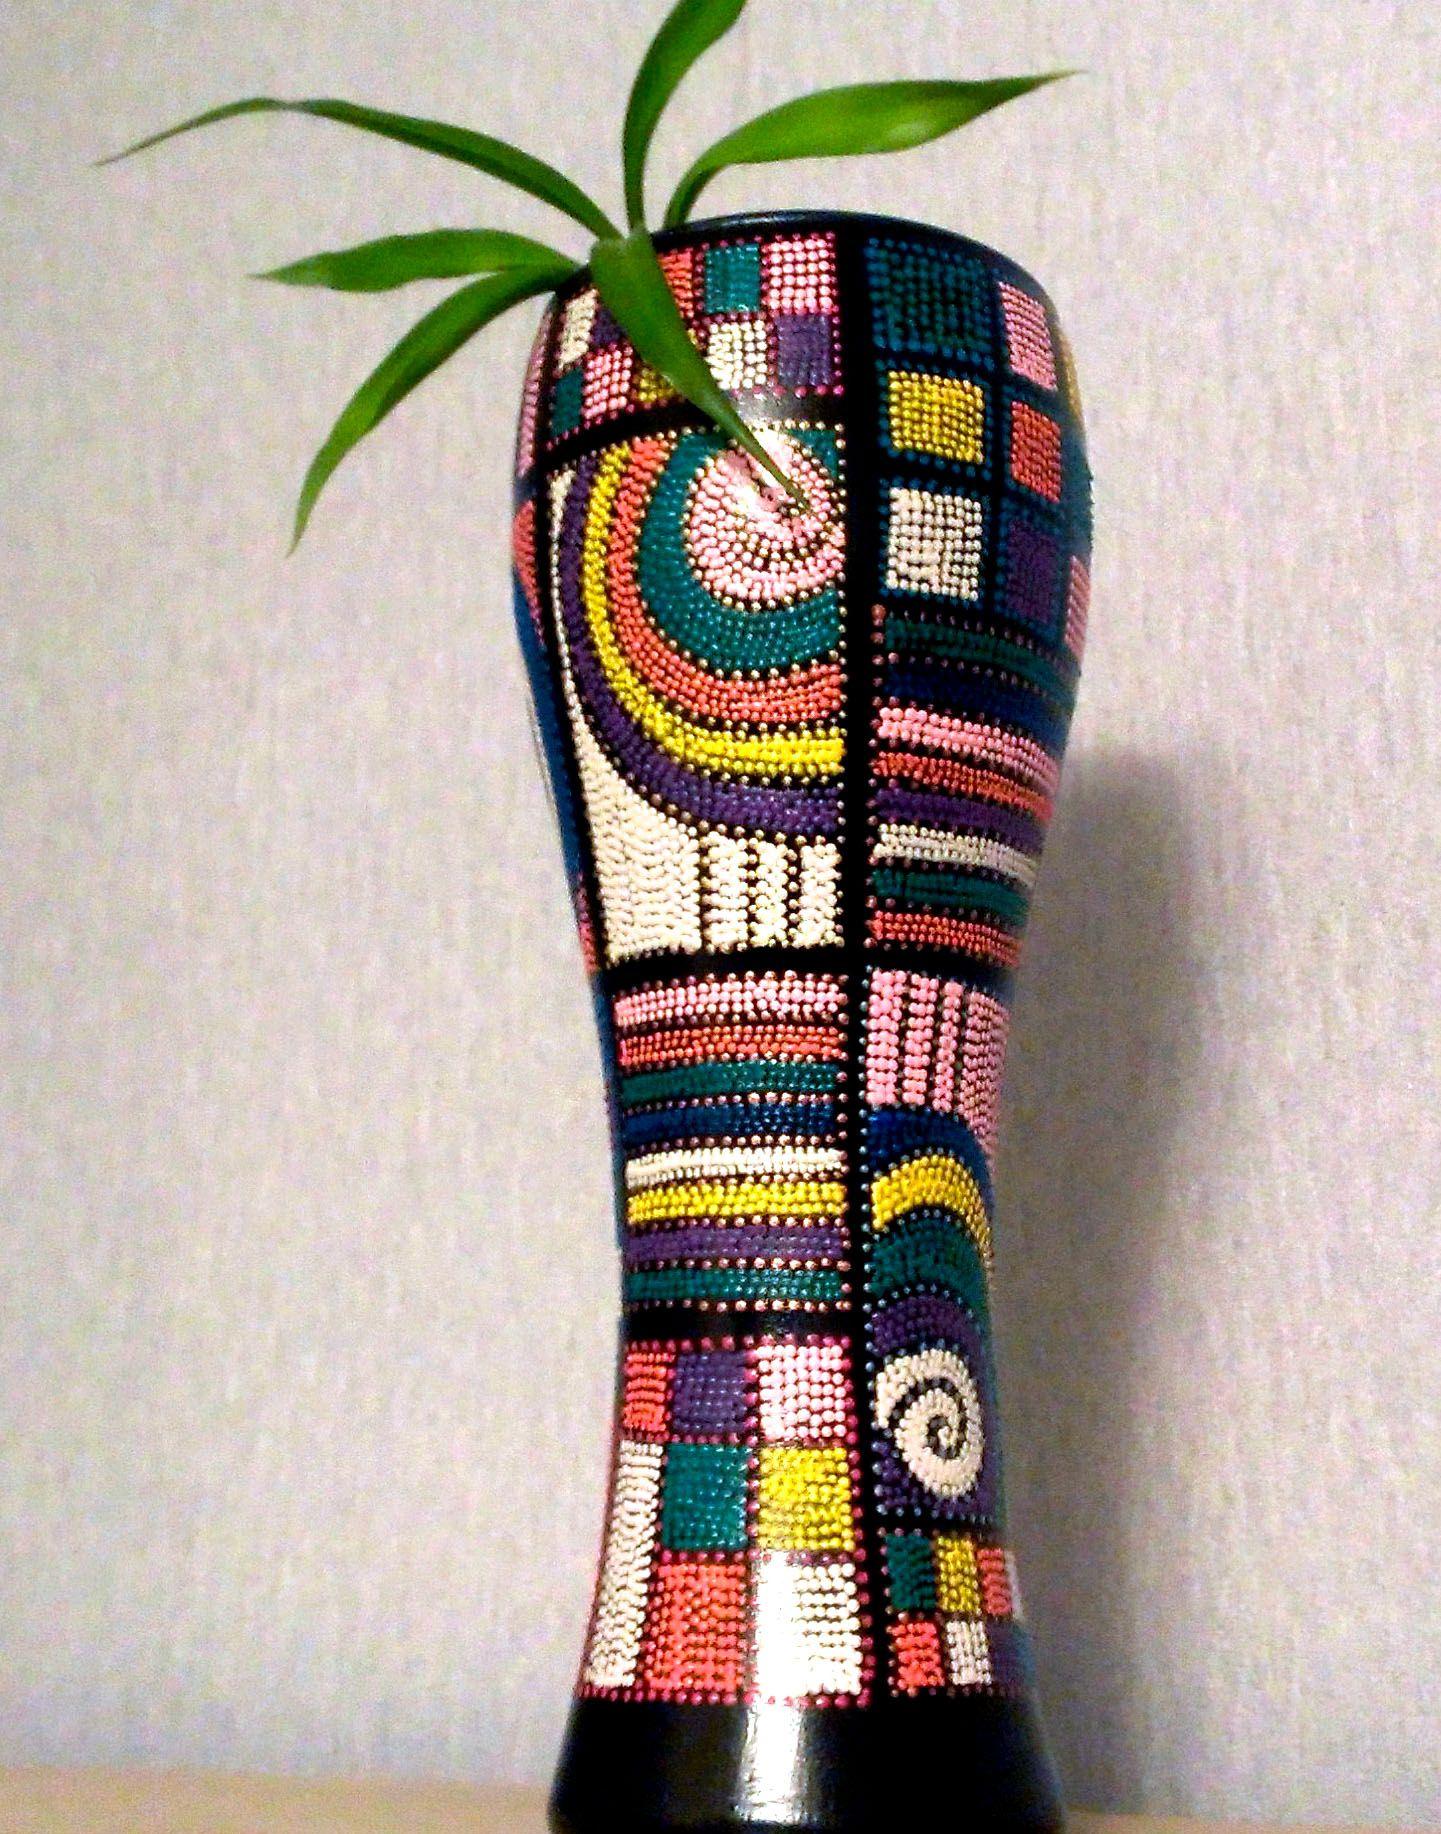 ручнаяработа подарок декоративнаятарелка декор точечнаяроспись тарелка ваза handmade узоры джаз декоративнаяваза цветы